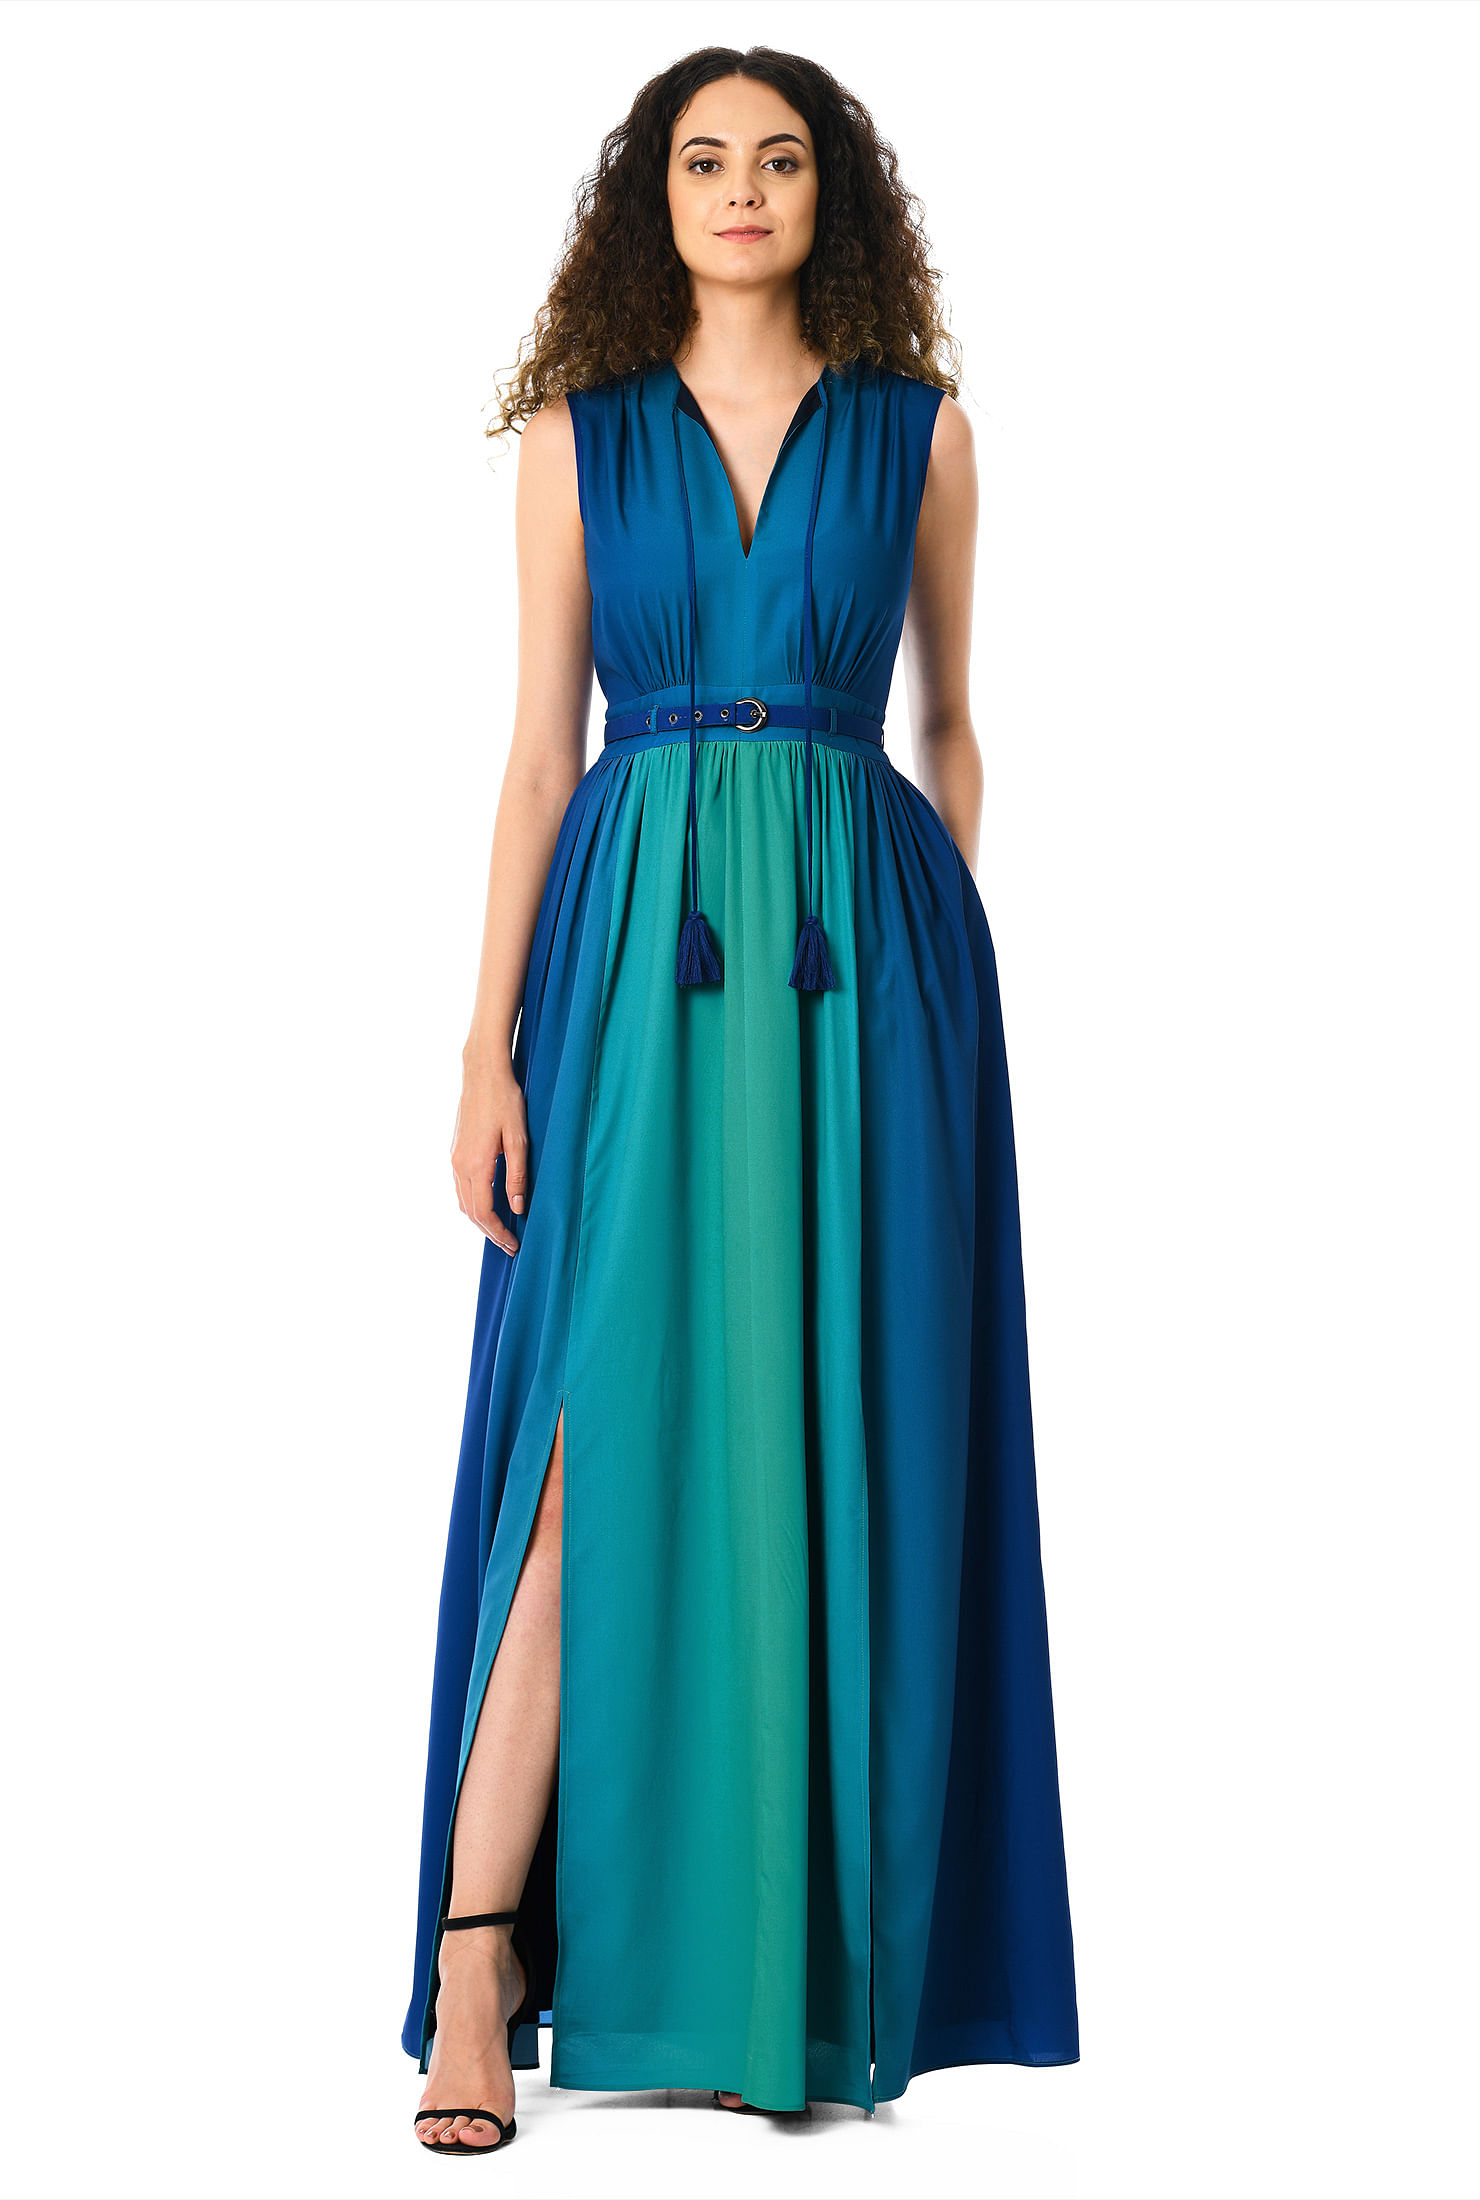 e814528356 blue/green dresses, Full Length Dresses, lightweight Dresses, machine wash  dresses